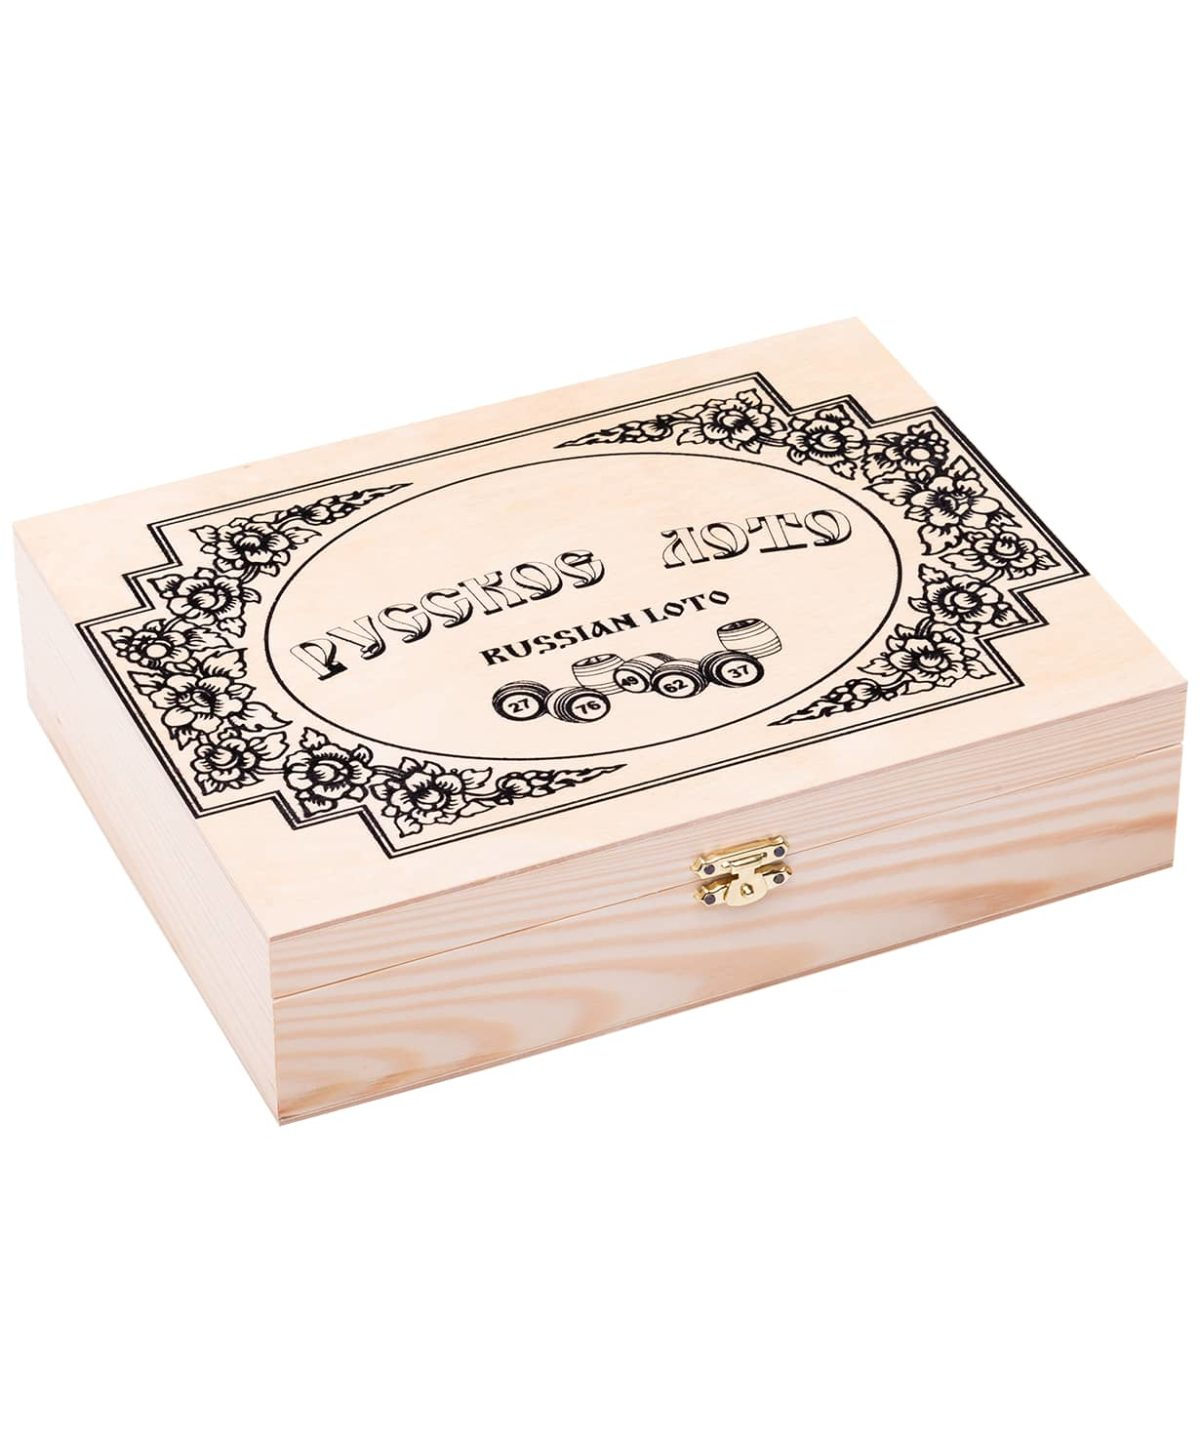 ПРАЙМ СПОРТ Лото бочонок деревянный, деревянная шкатулка  271-18 - 1